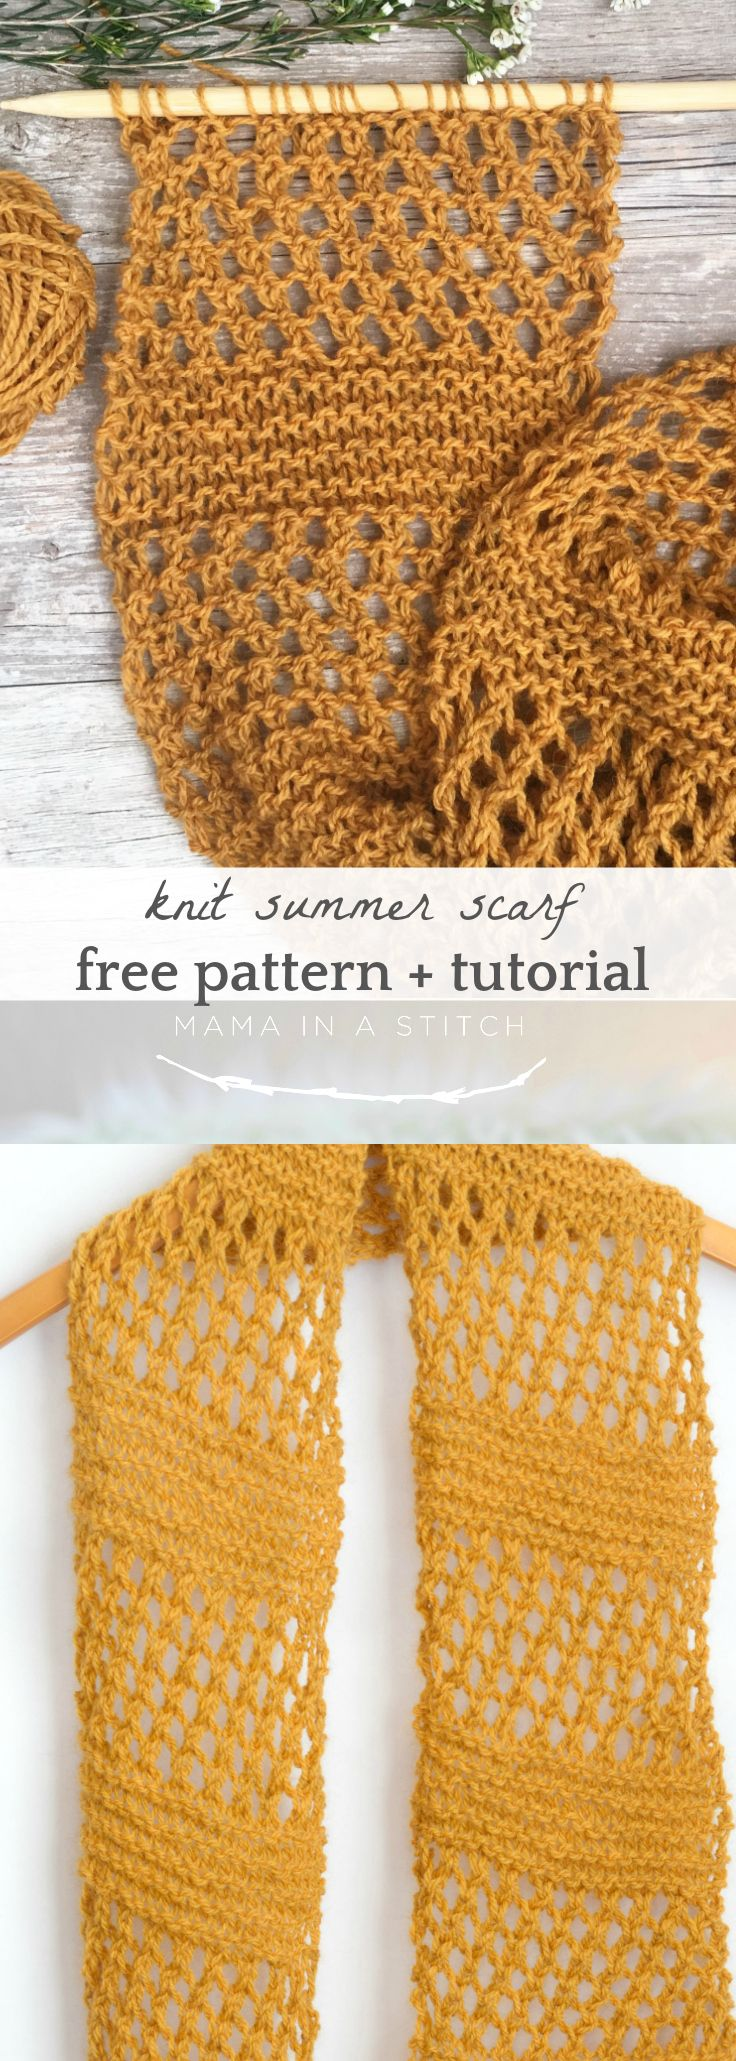 Honeycombs Summer Easy Scarf Knitting Pattern via @MamaInAStitch #freeknittingpattern #diy #gifts #mothersday #spring #style #knittingpattern